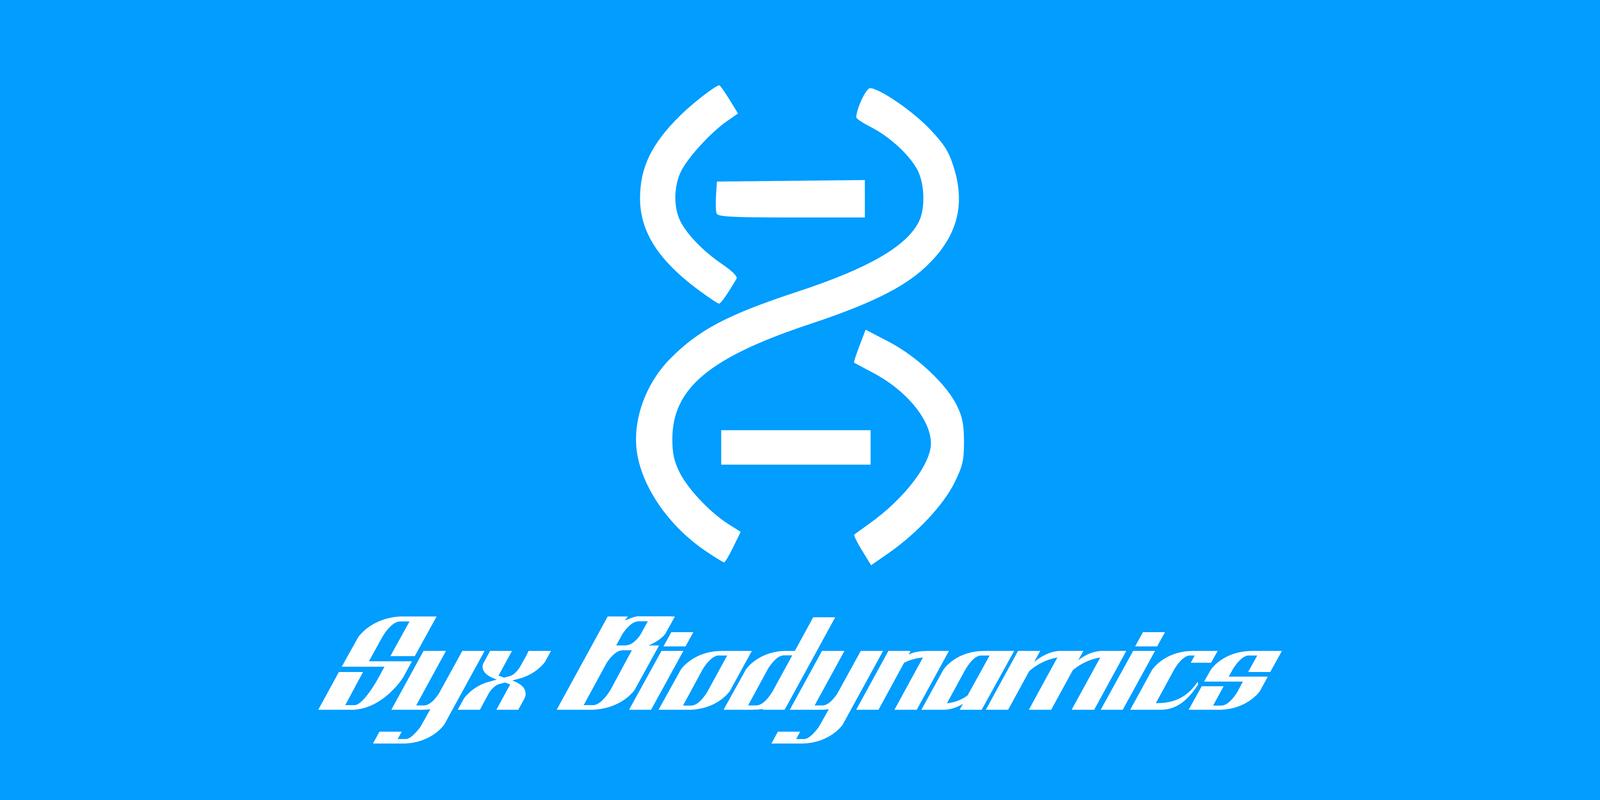 Syx Biodynamics by achaley